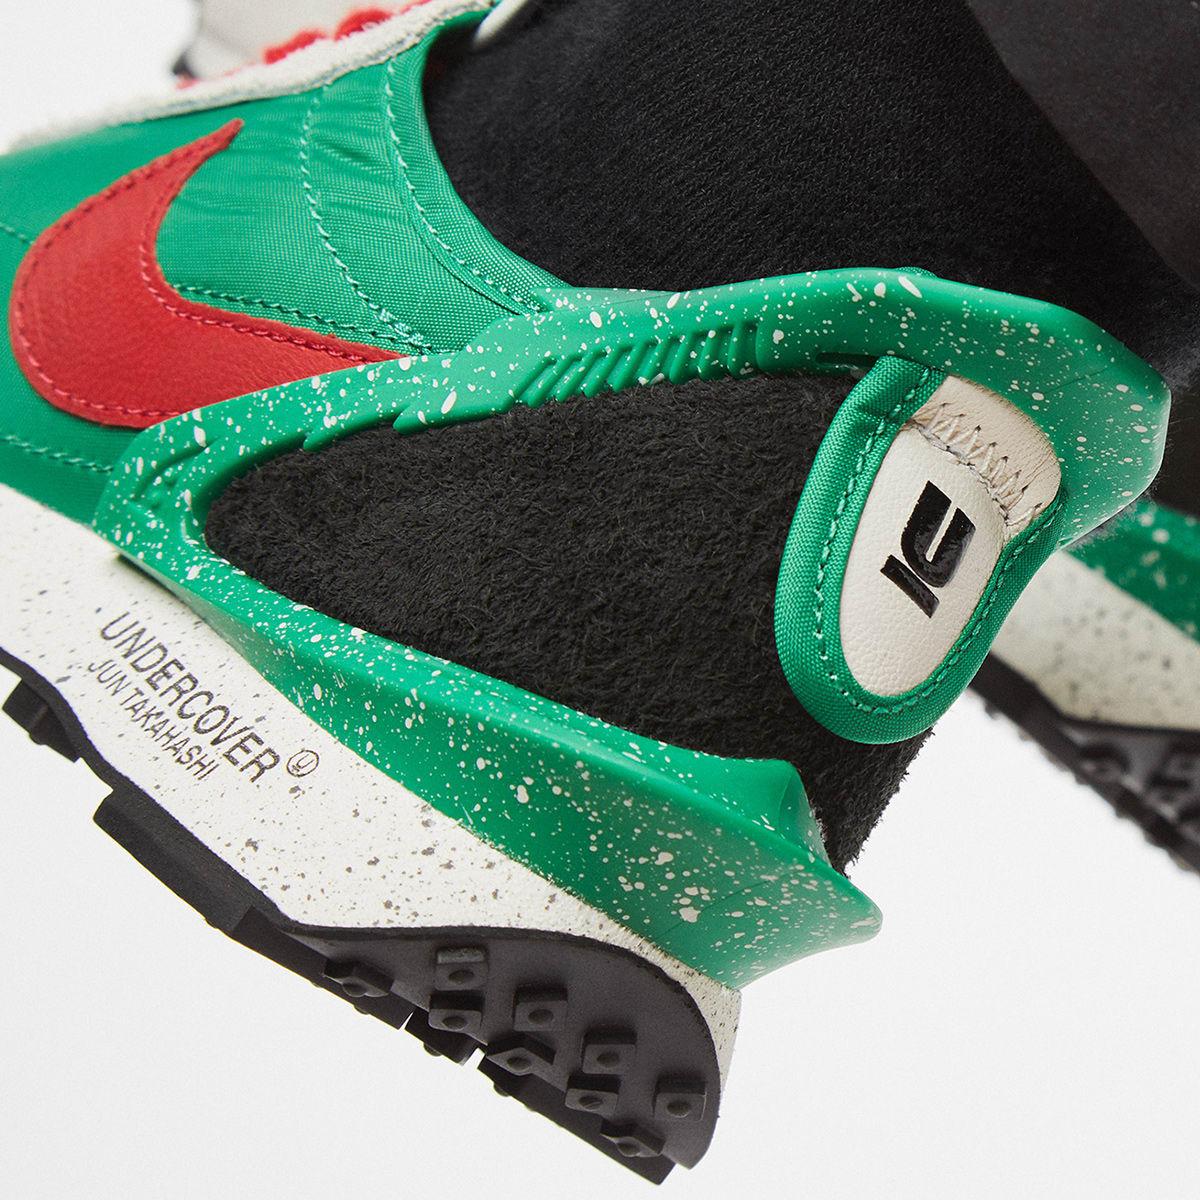 Nike x Undercover Daybreak - CJ3295-300